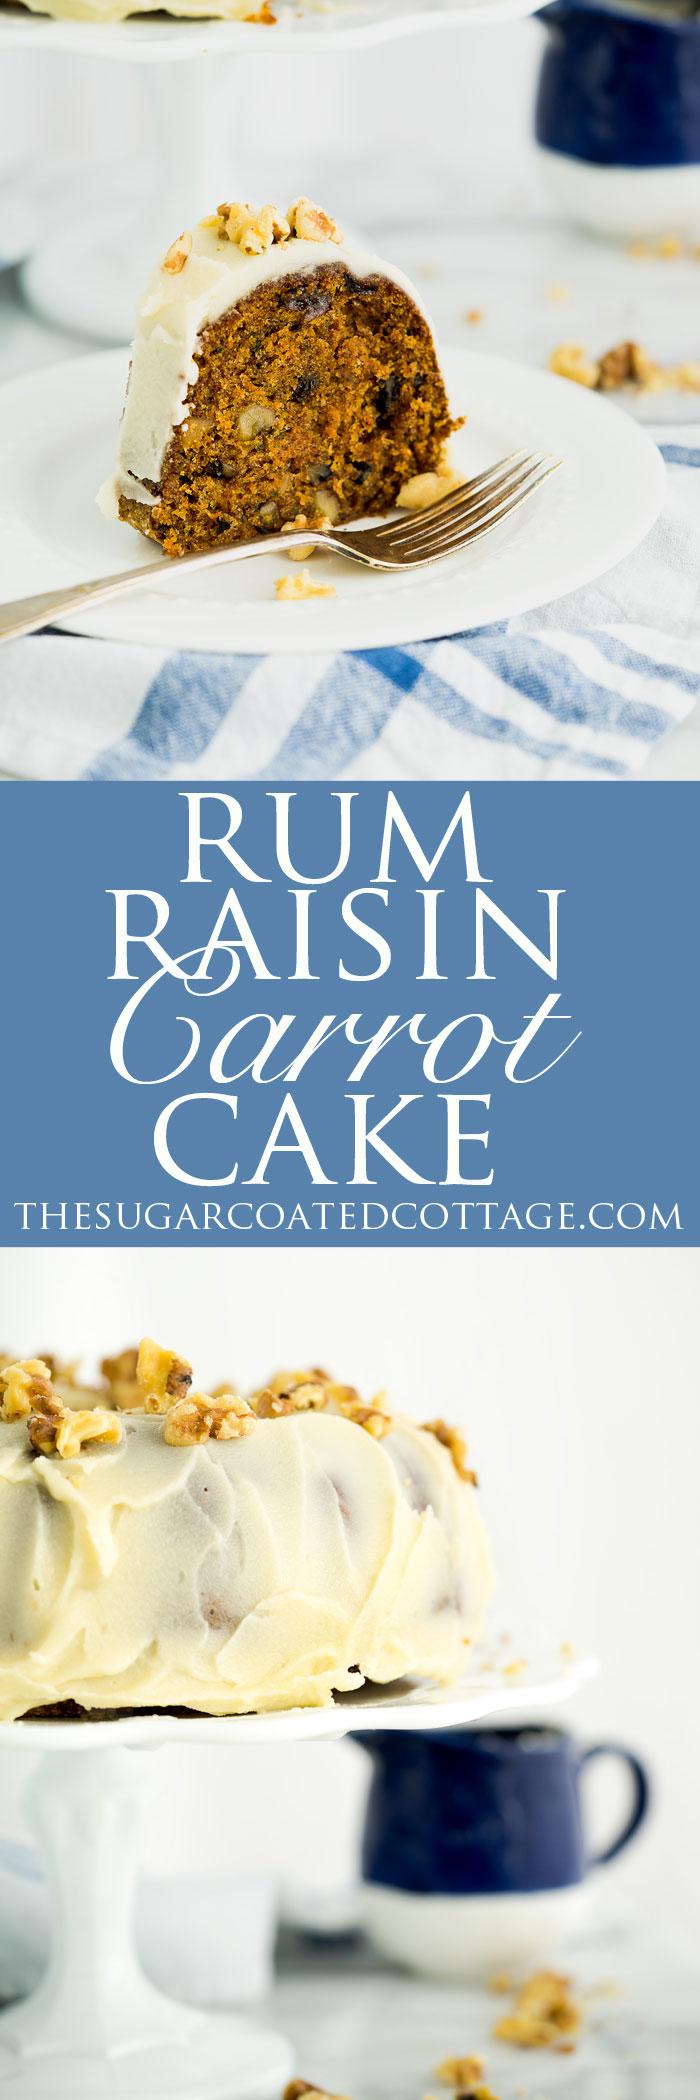 Rum Soaked Carrot Cake